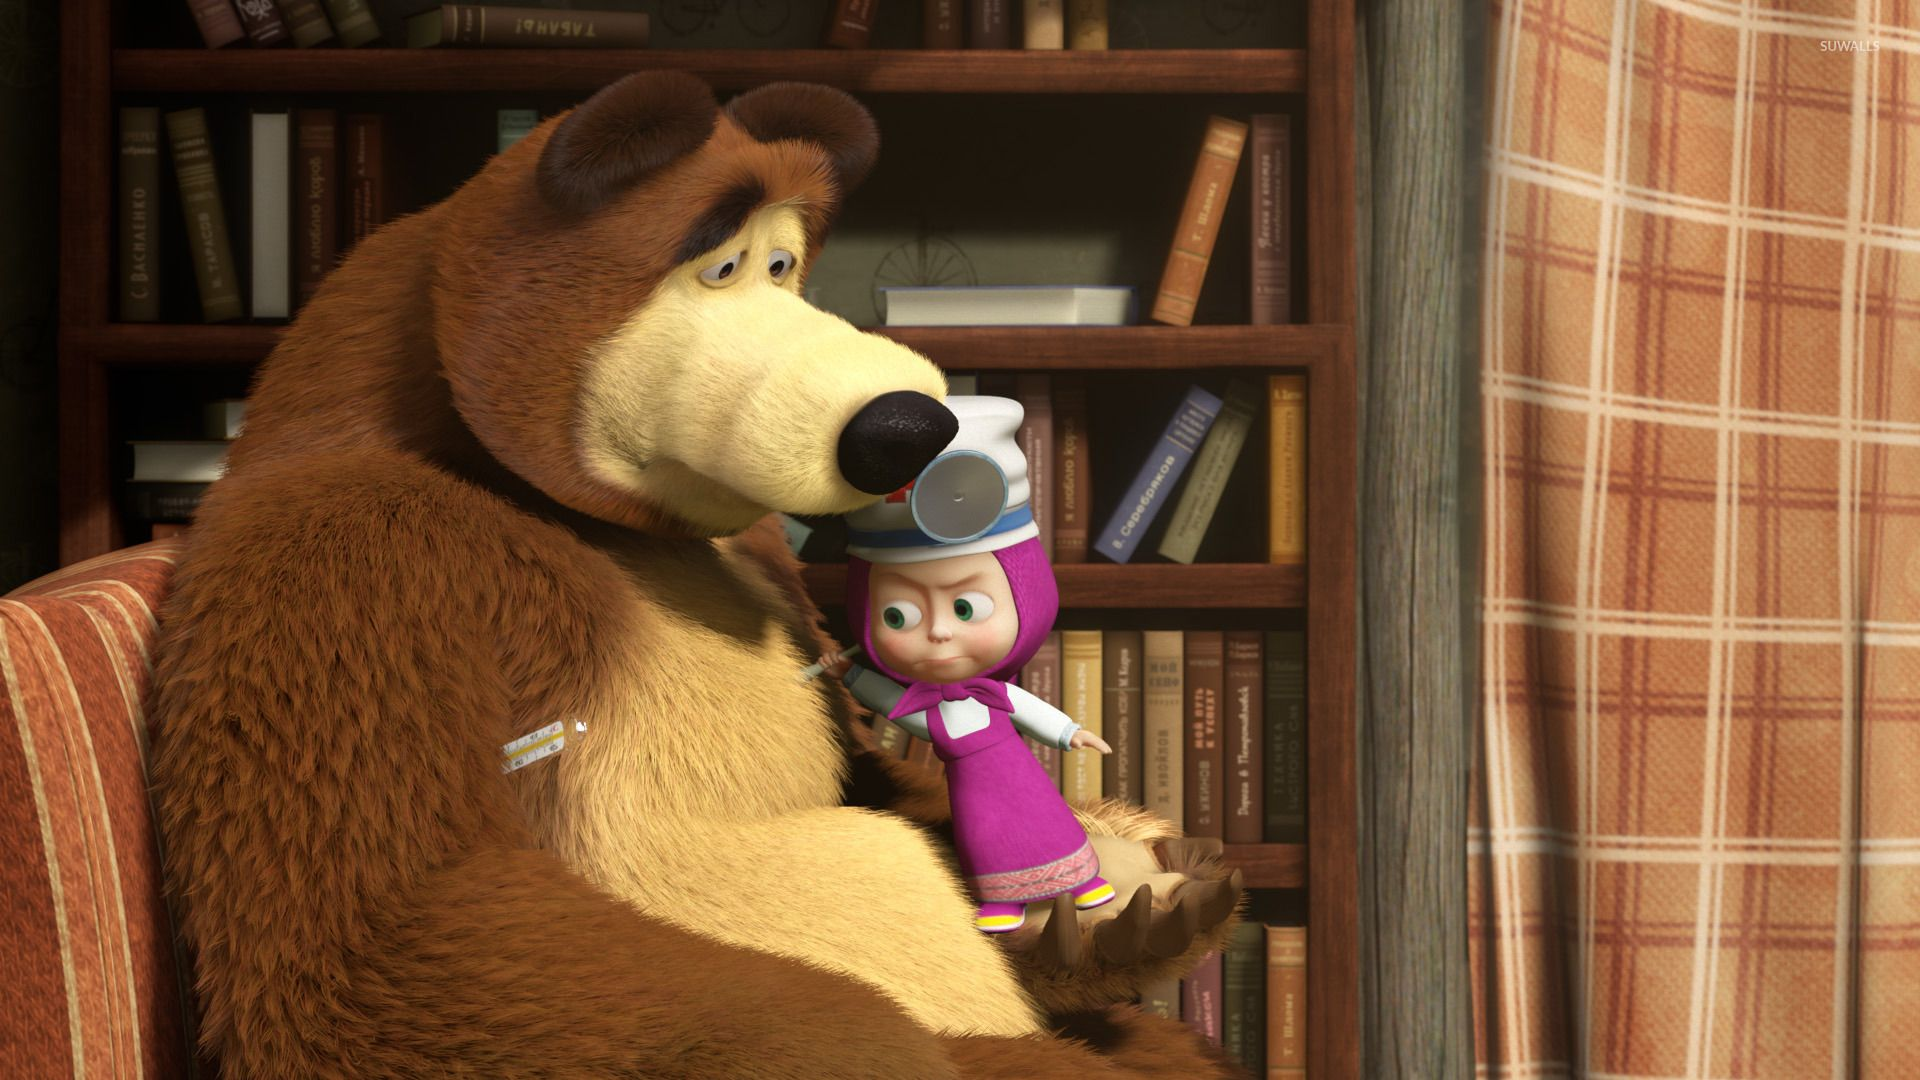 Masha And The Bear 15 Wallpaper Cartoon Wallpapers 46518